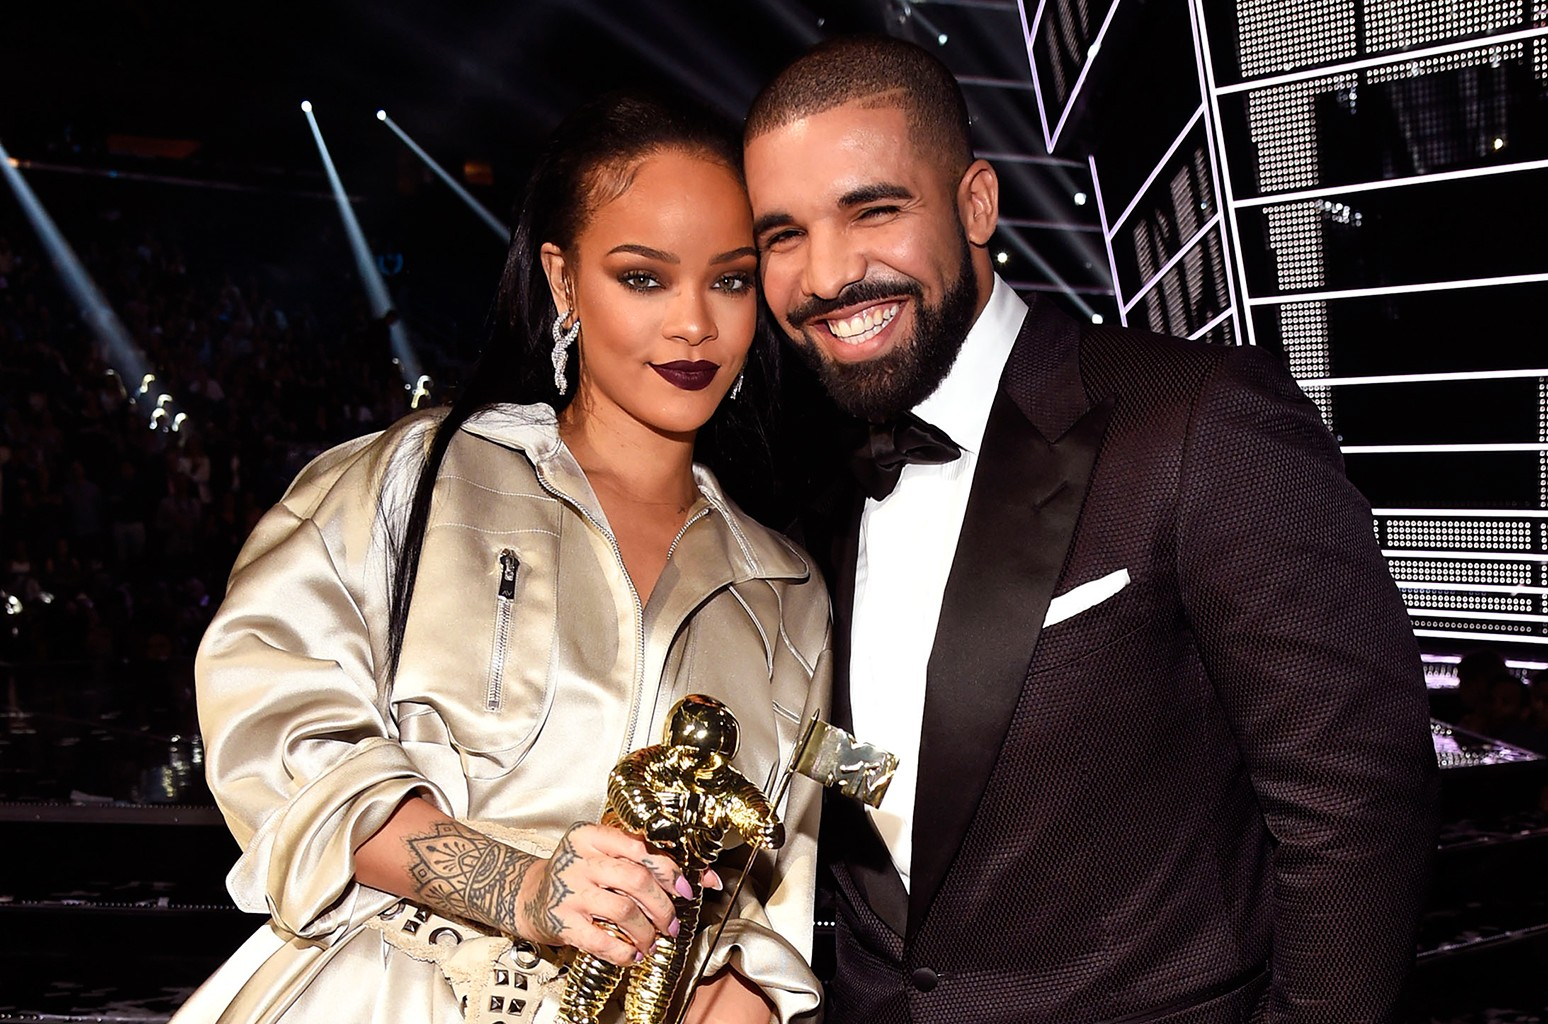 Drake updates on his relationship